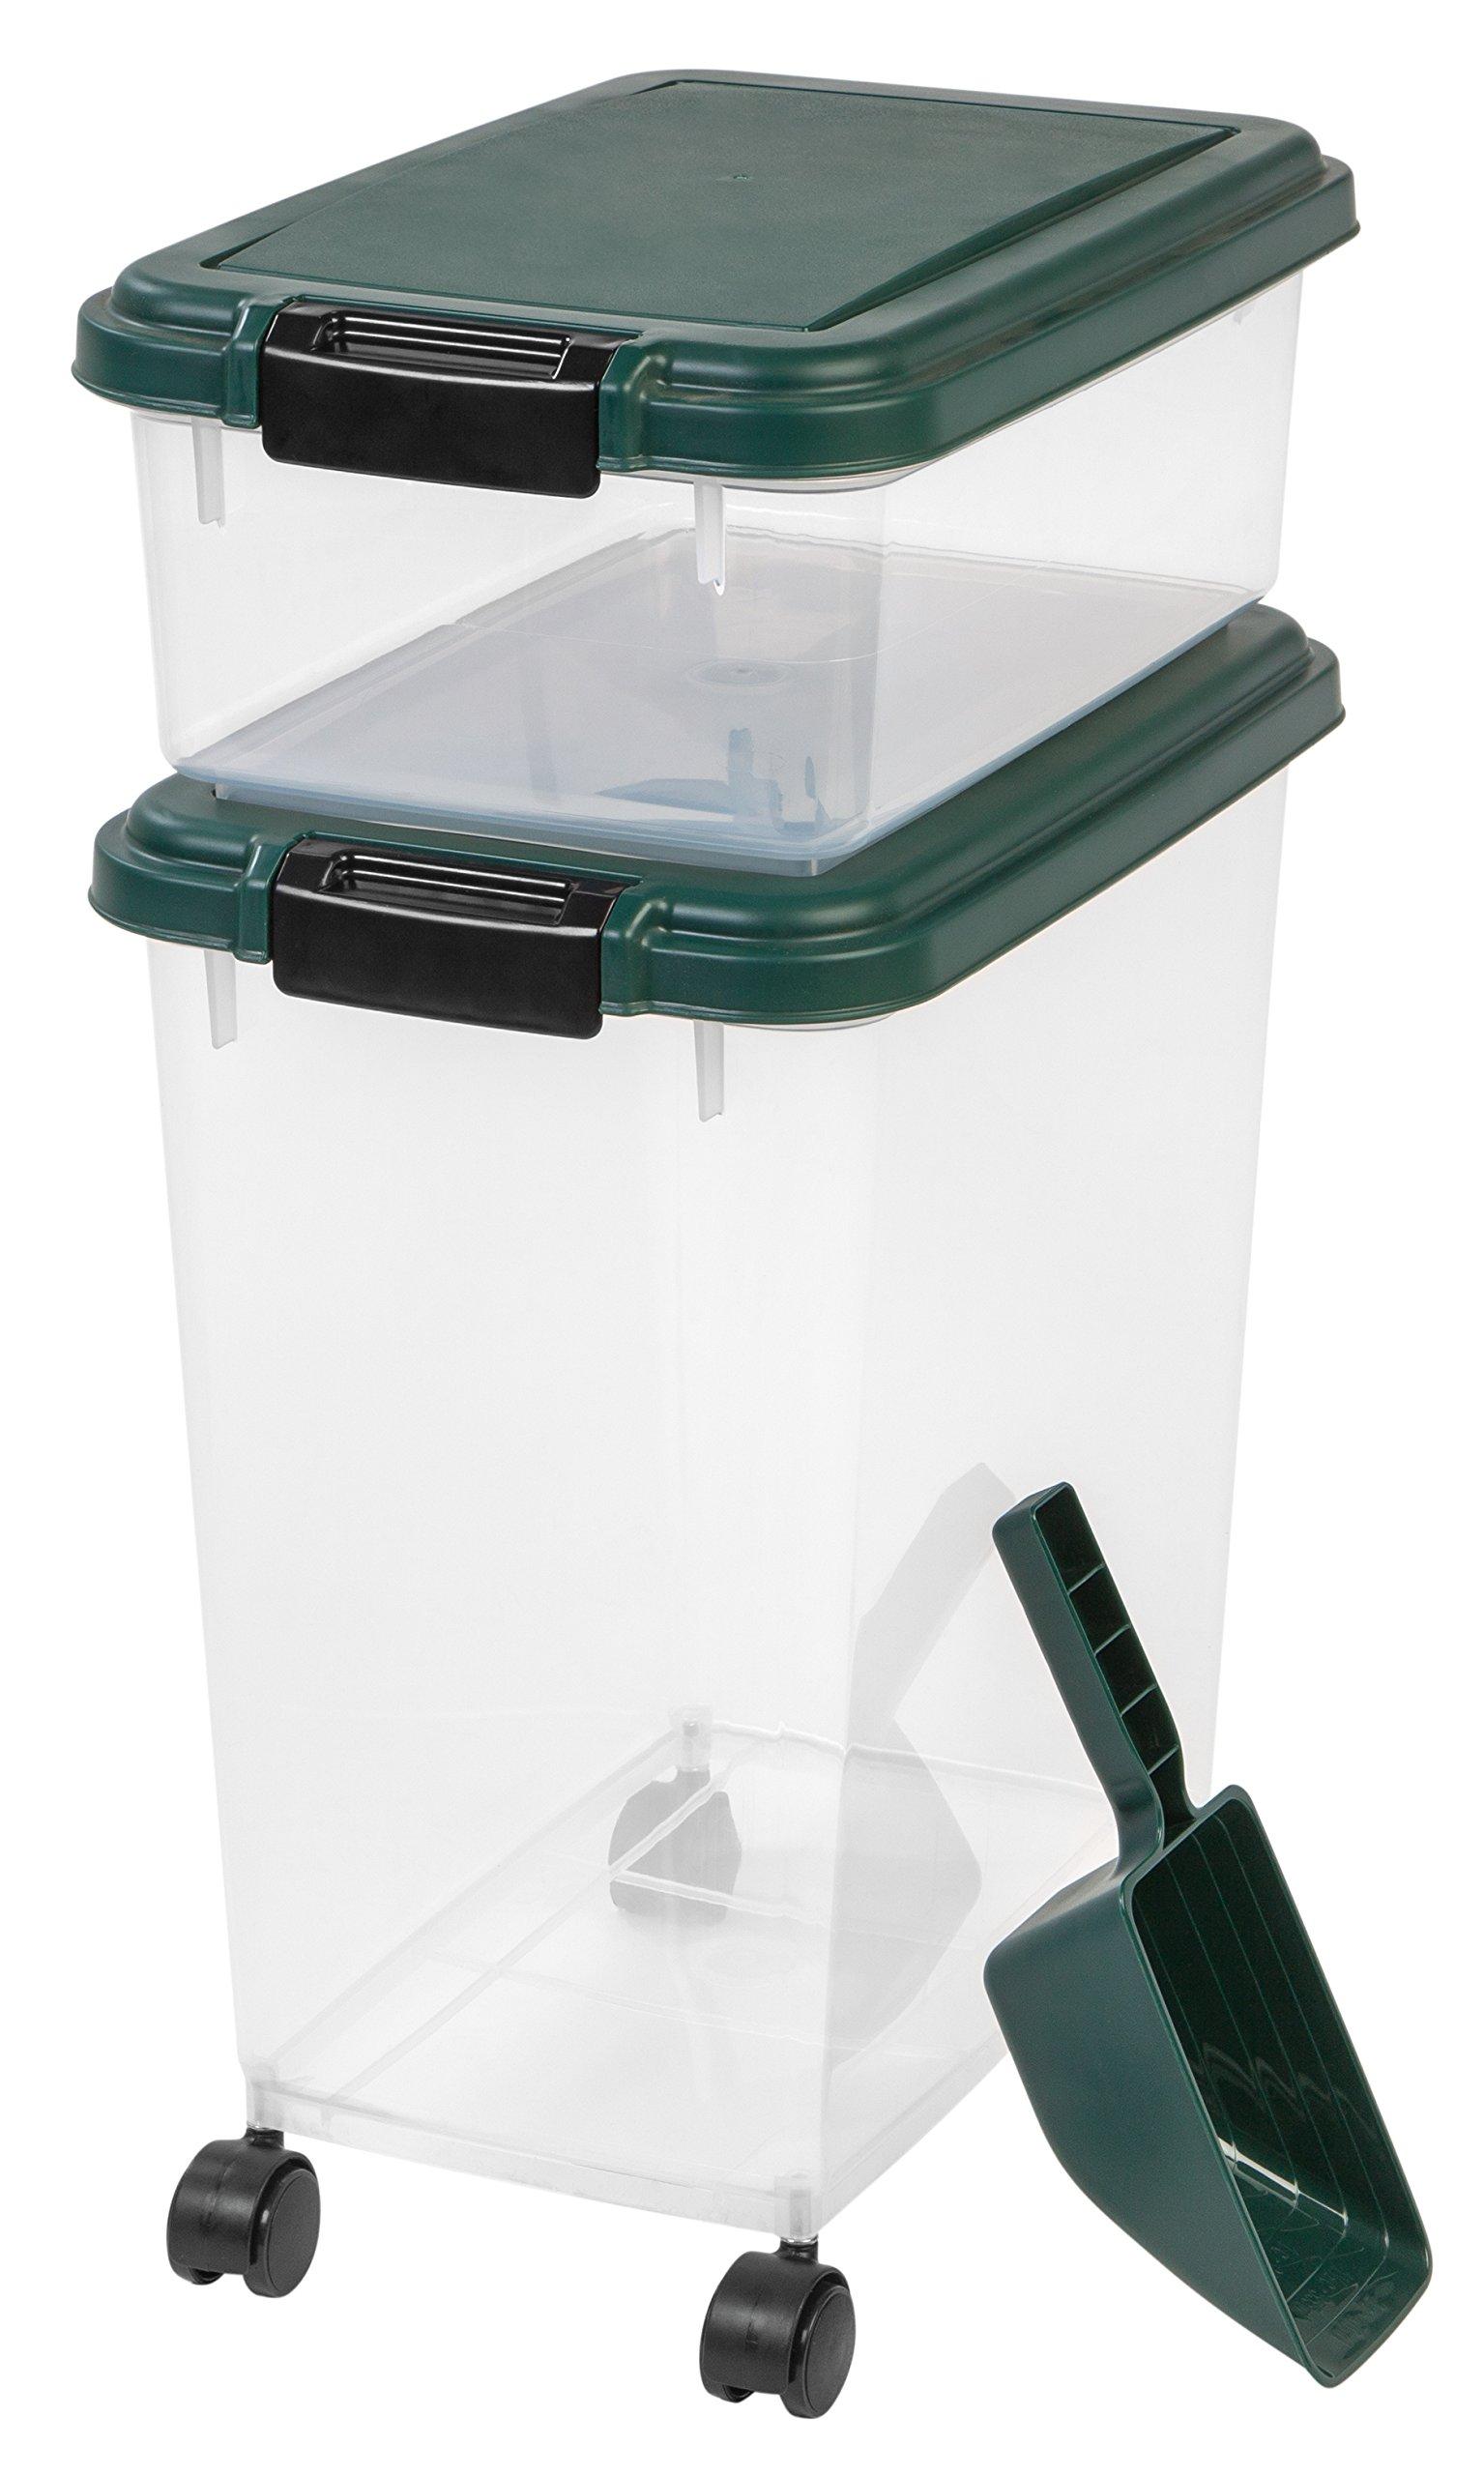 IRIS USA, Inc. 3Piece Remington Airtight Pet Food Storage Container Combo, Green by IRIS USA, Inc.